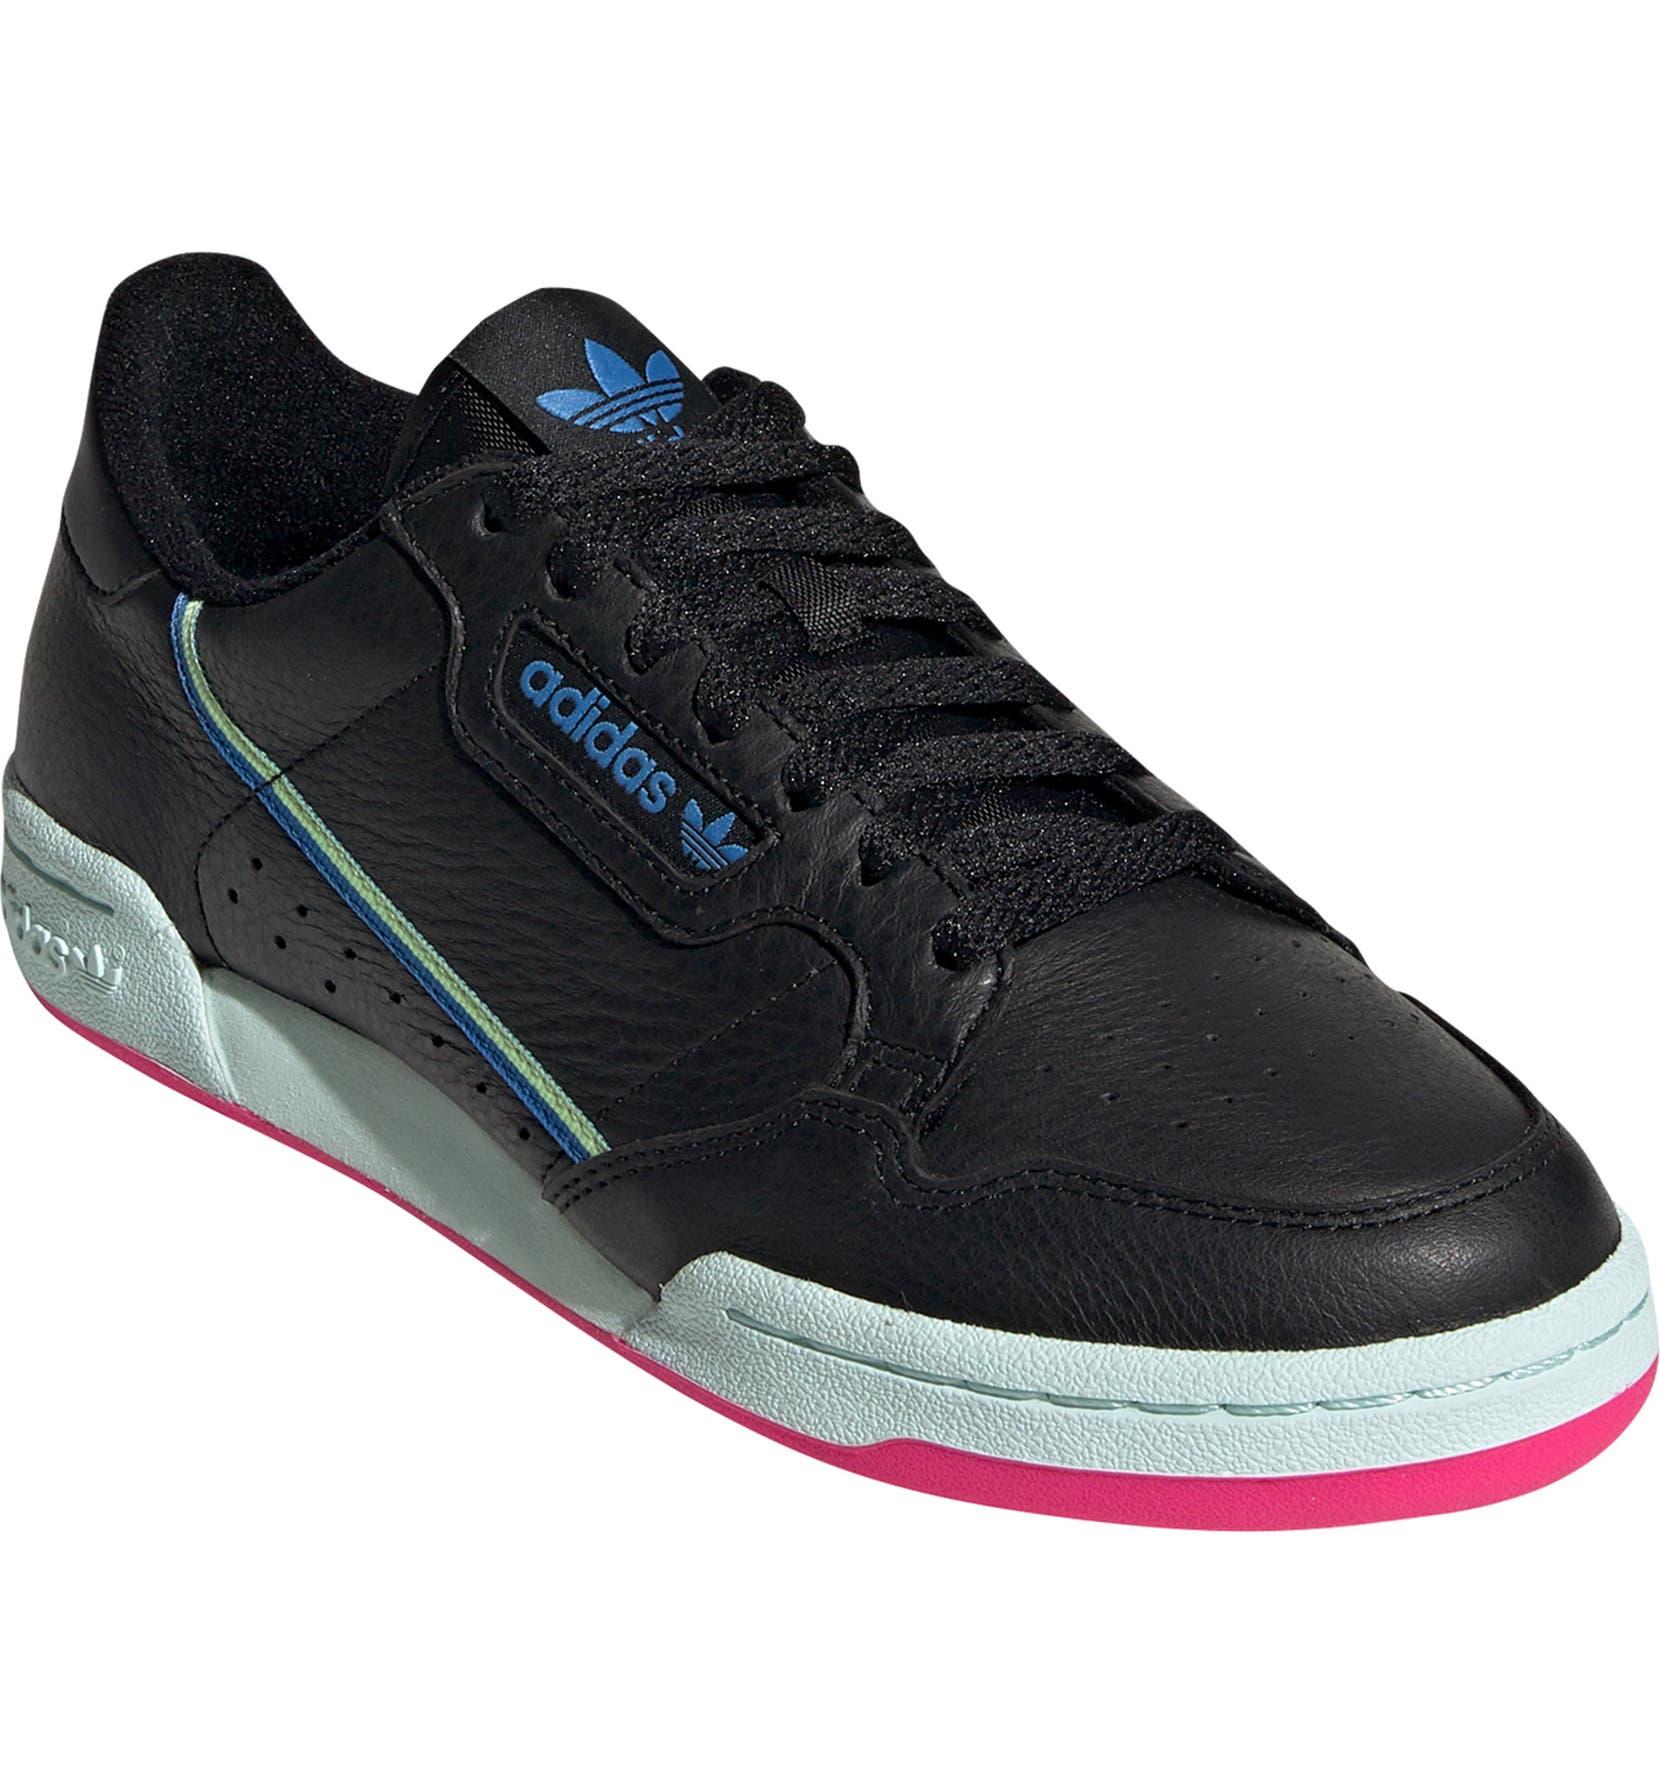 best sneakers 2ebb9 02728 adidas Continental 80 Sneaker (Unisex)   Nordstrom